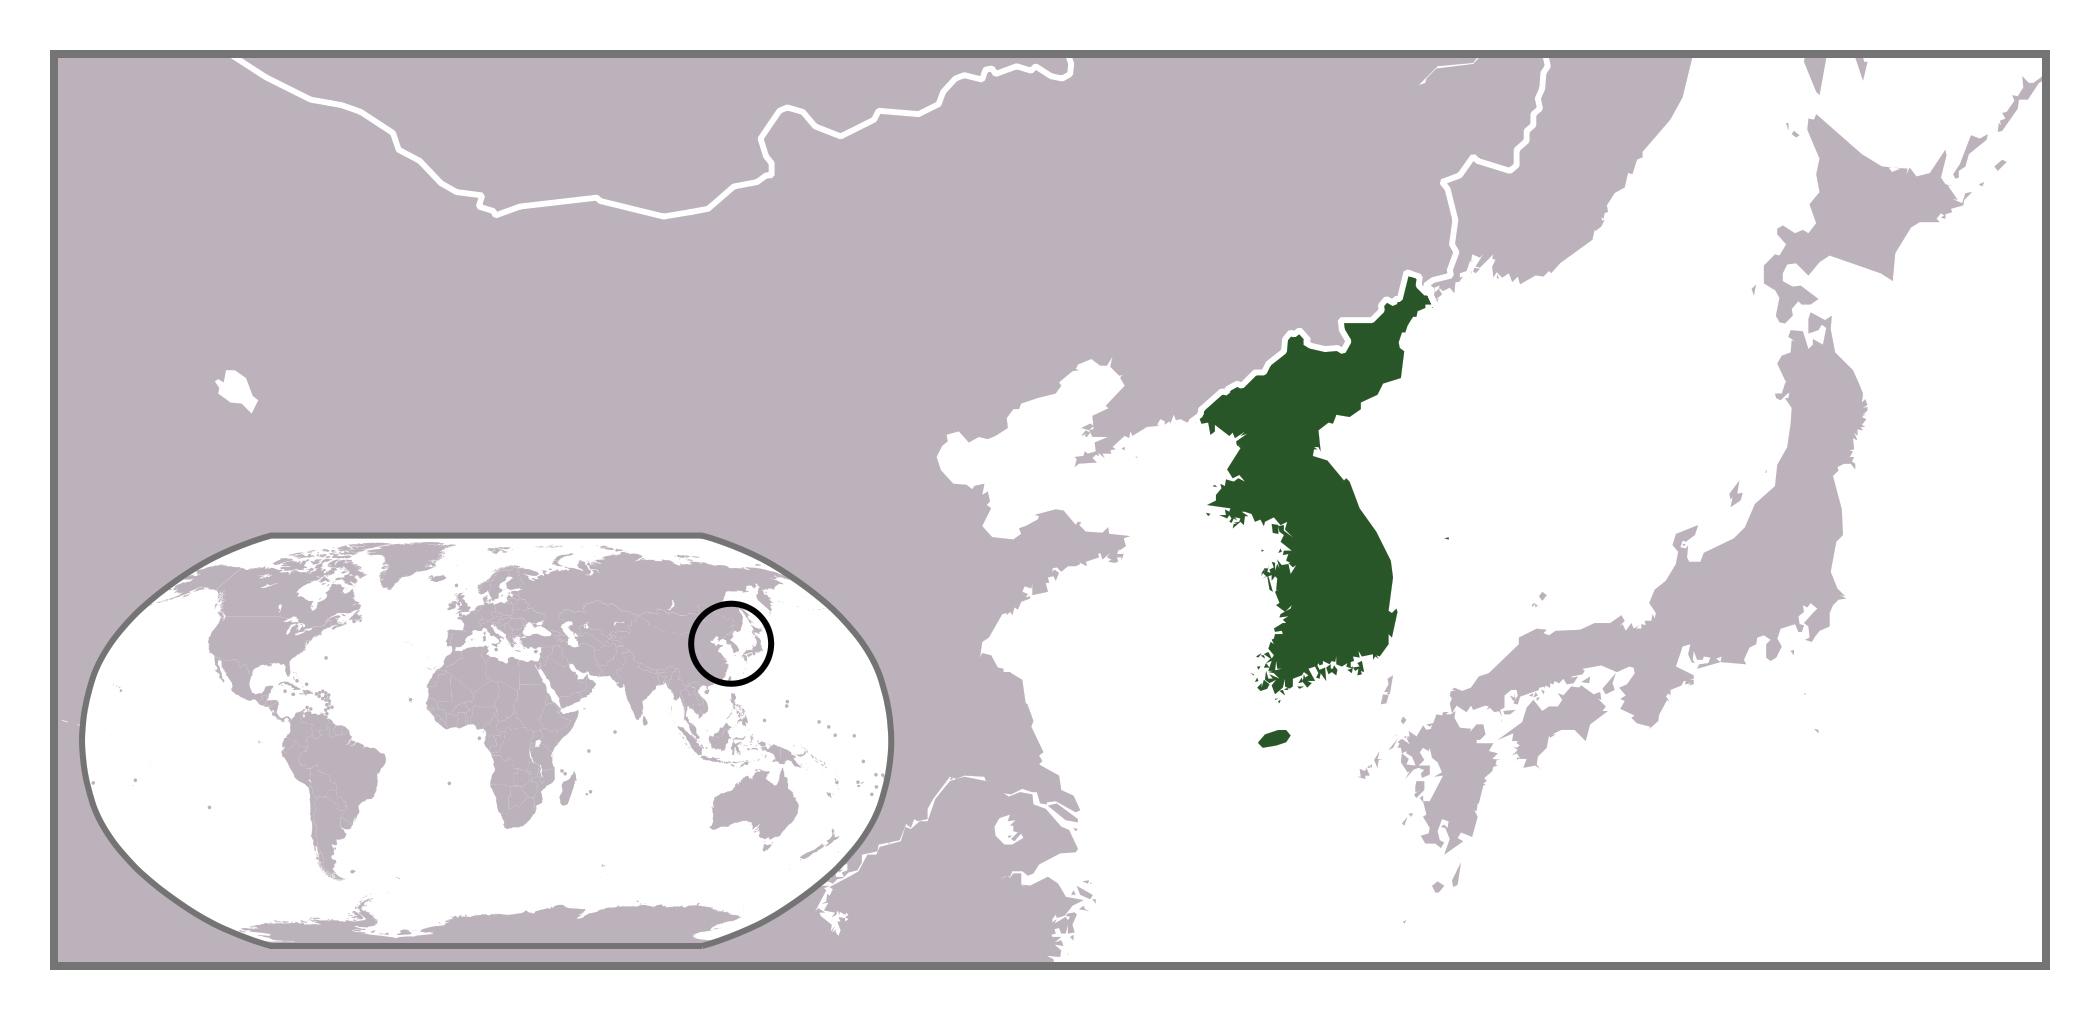 Korean Peninsula On World Map Large location map of Korean Peninsula | North Korea | Asia